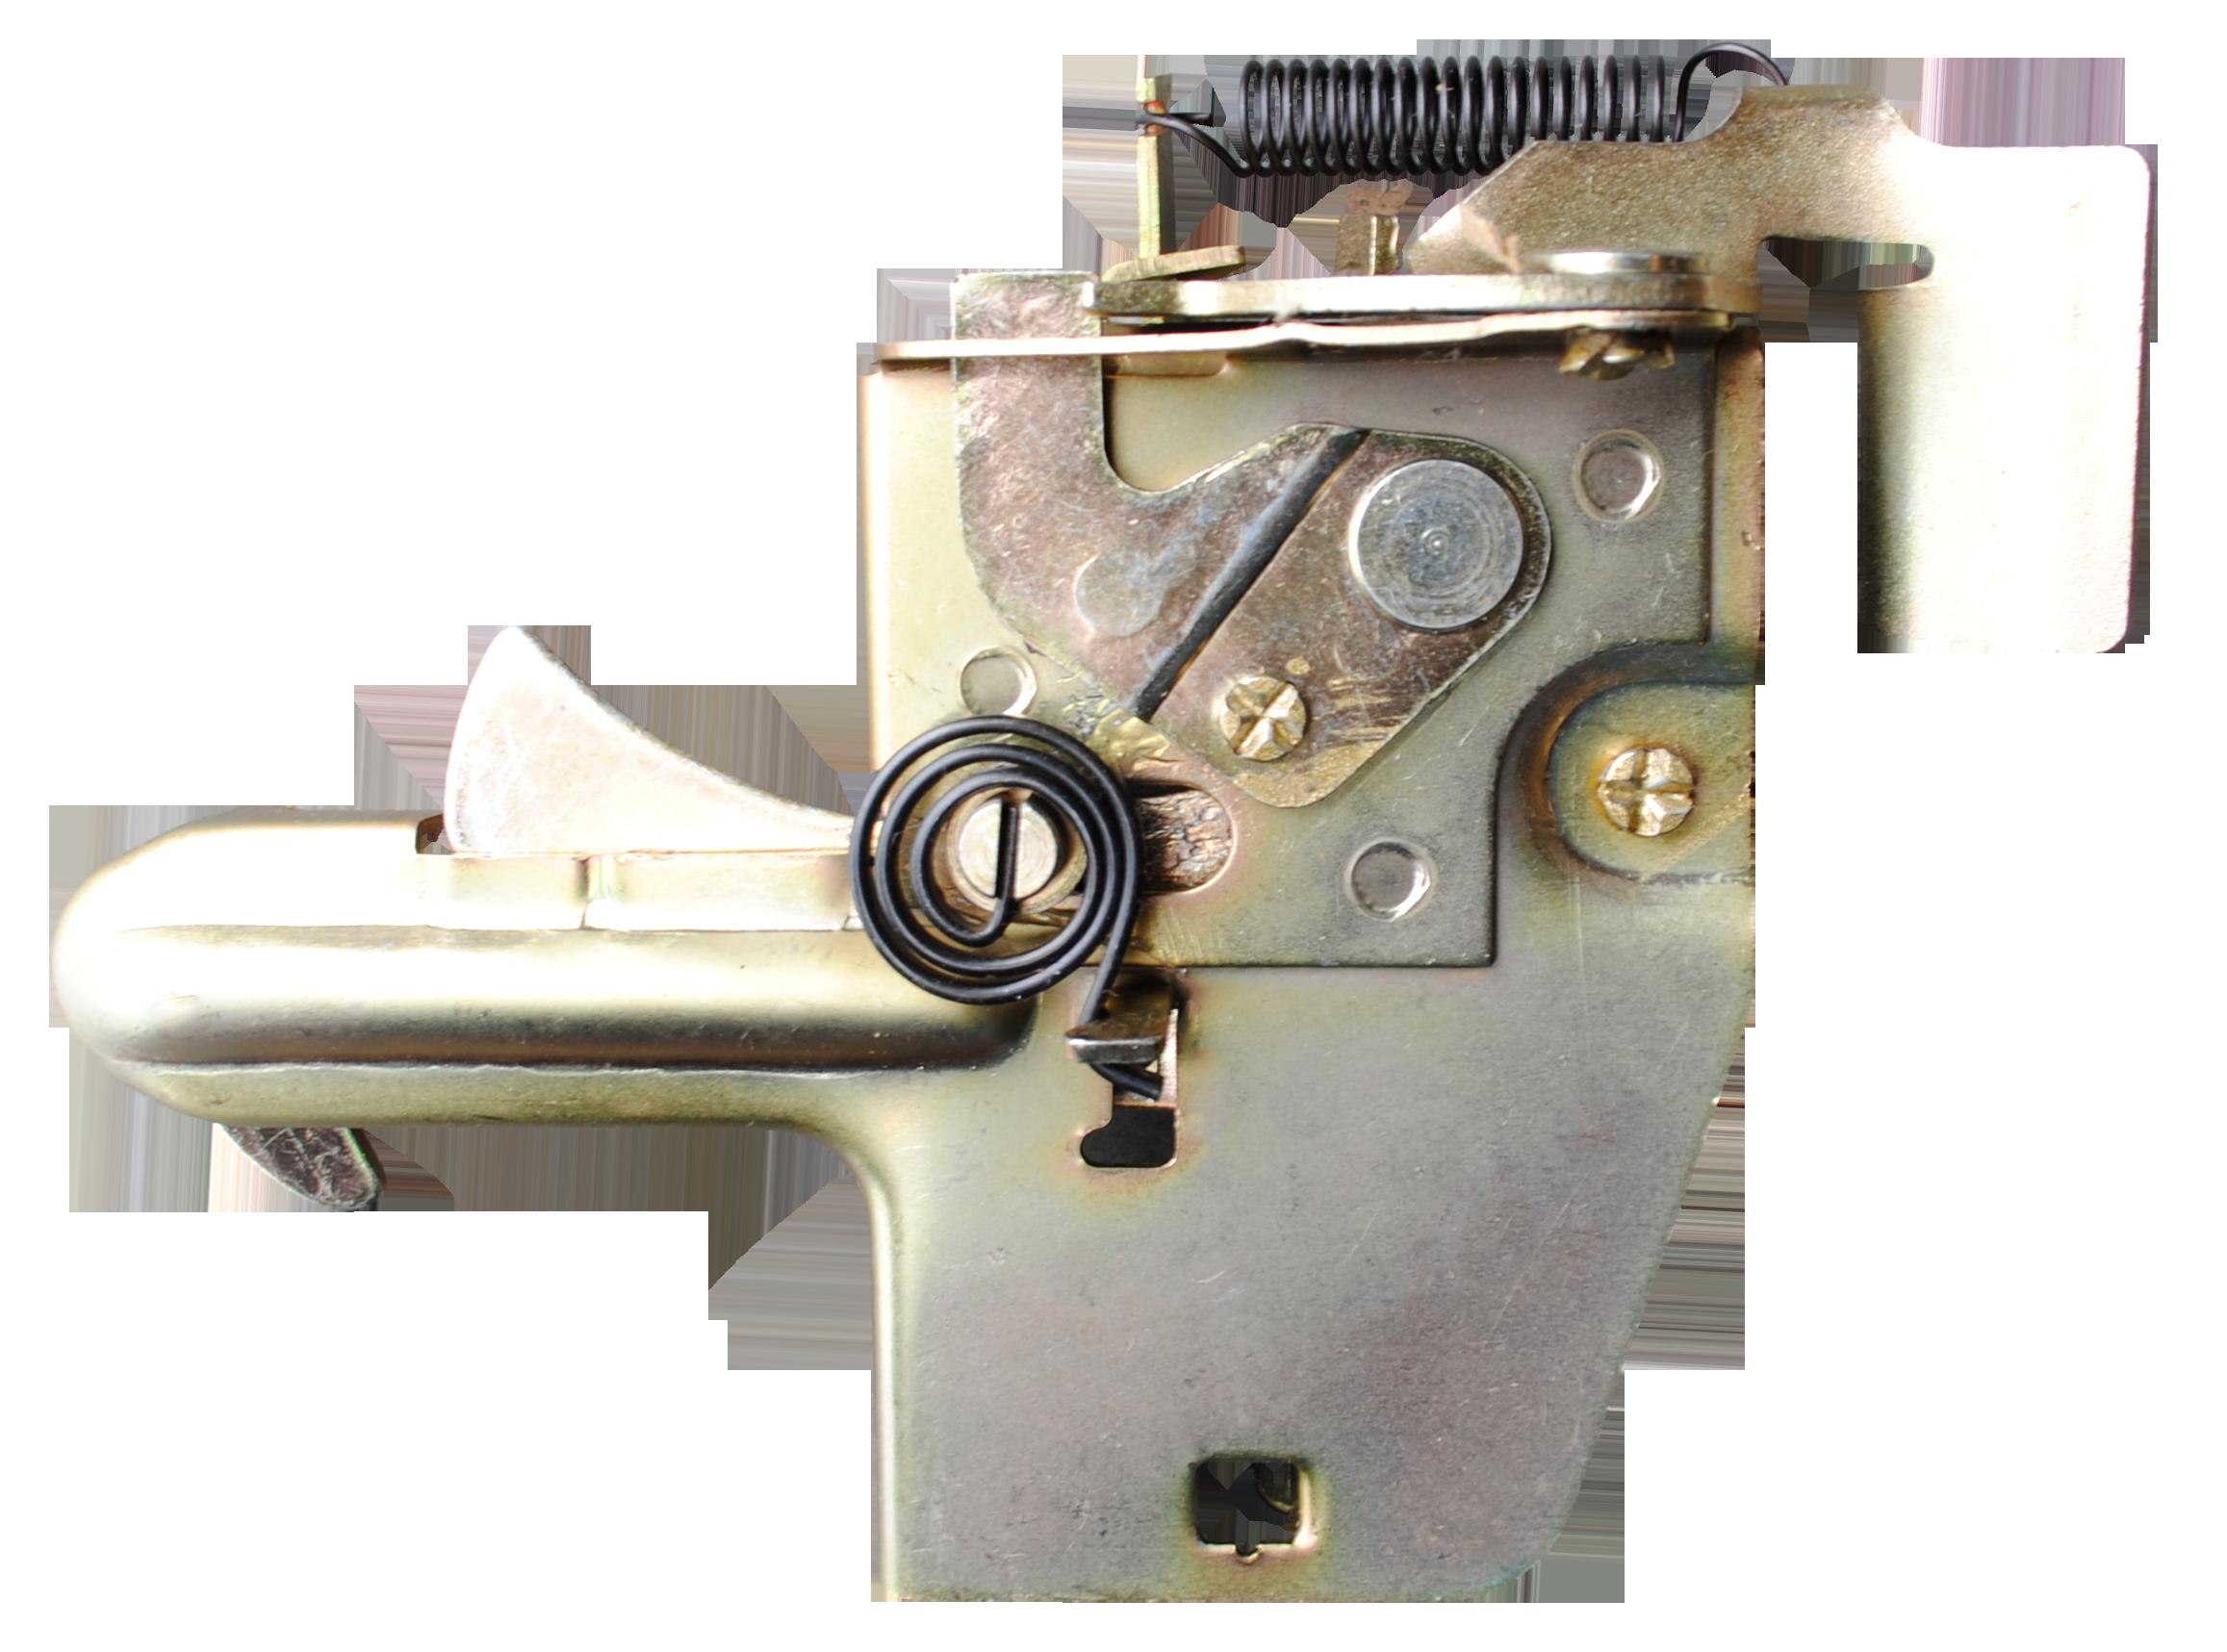 1958-59 C10 hood latch assembly